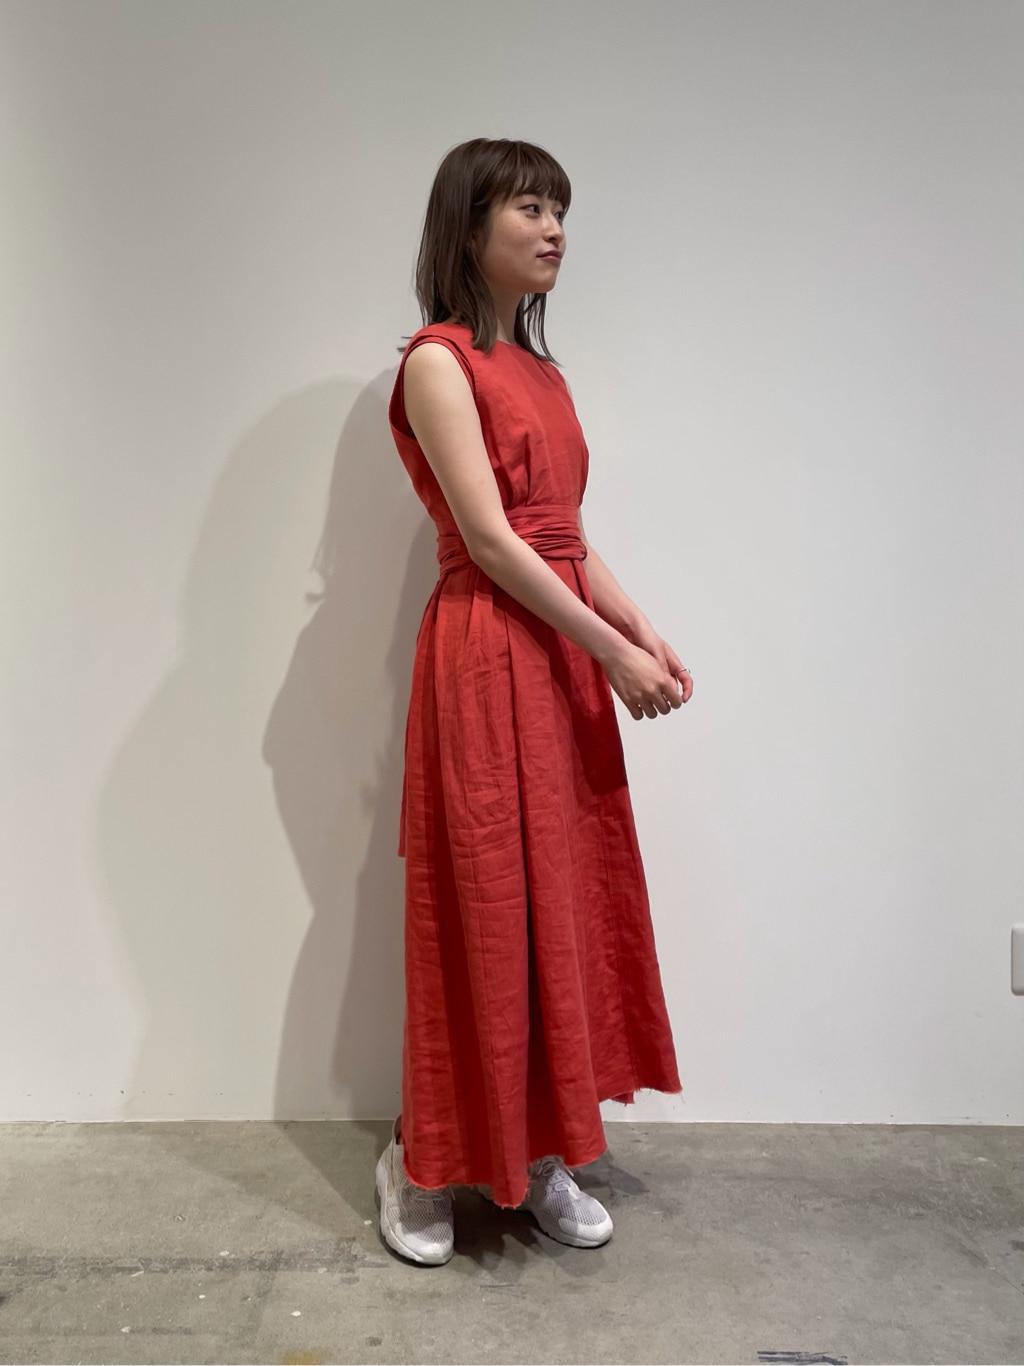 FLAT AMB 名古屋栄路面 2021.05.06